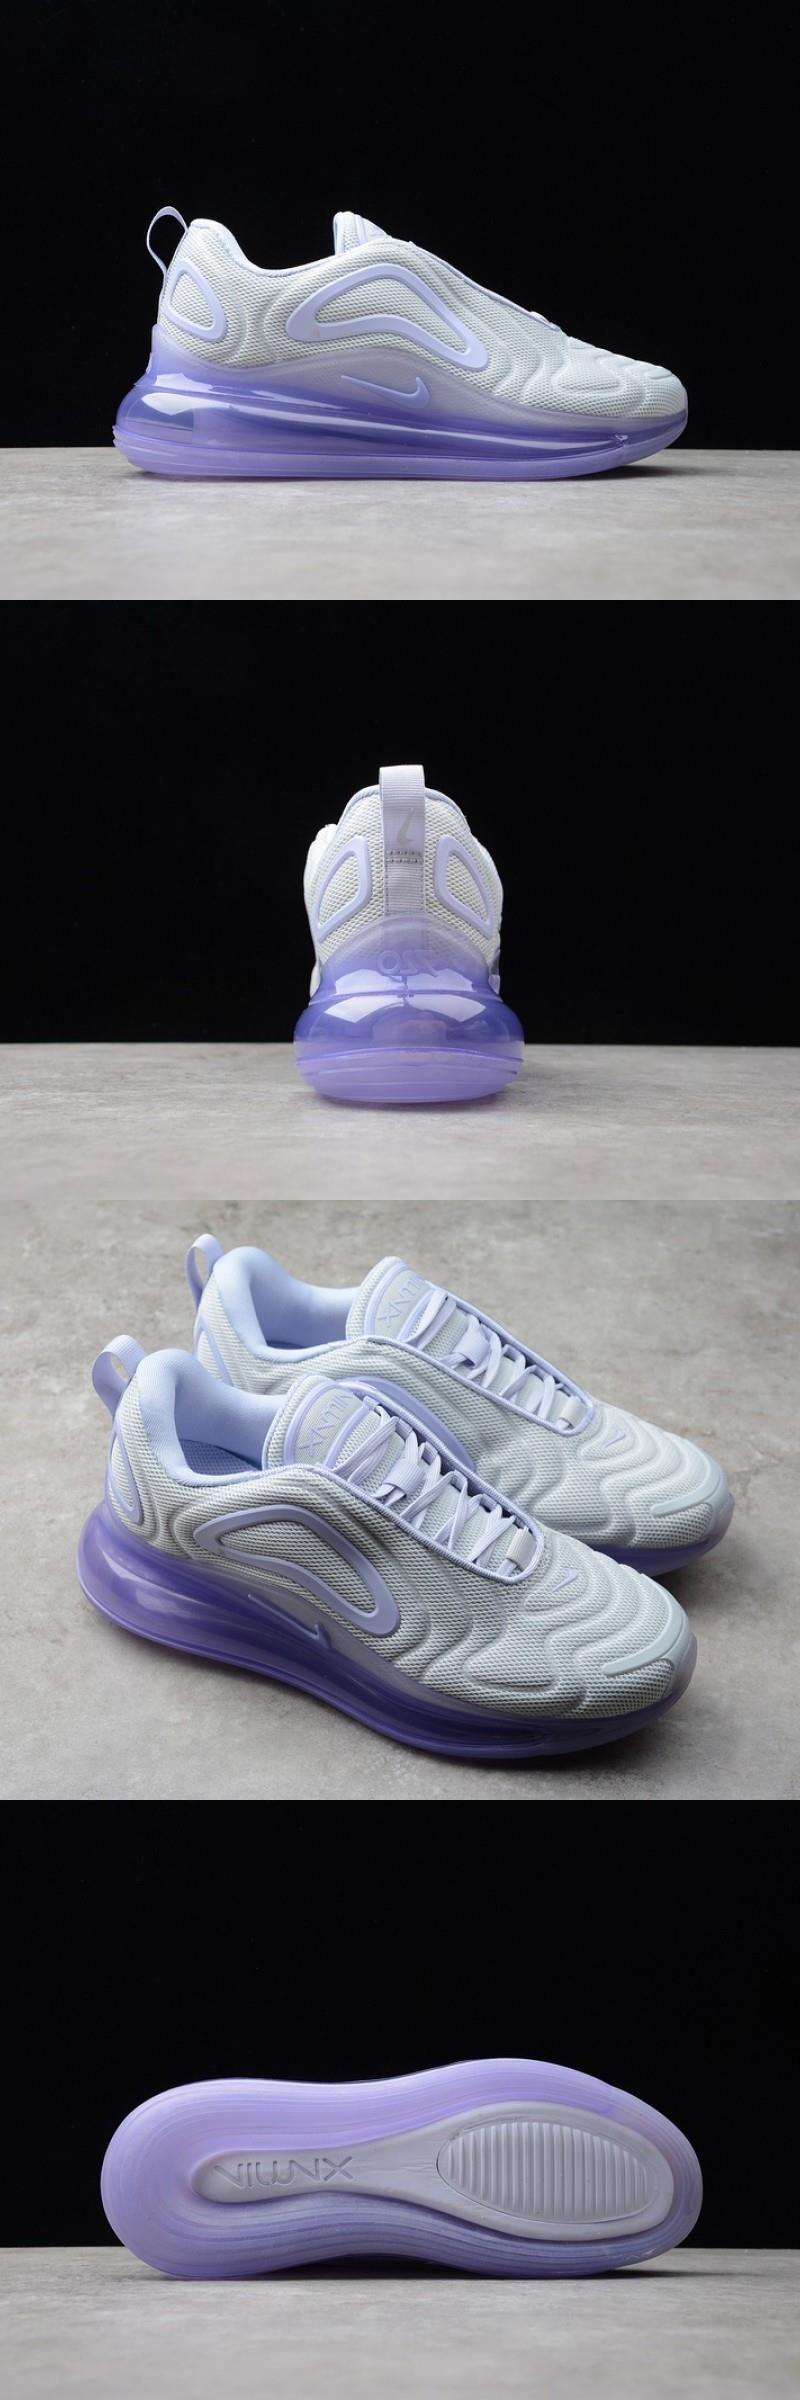 Nike W Air Max 720 Pure Platinum Oxygen Purple AR9293009